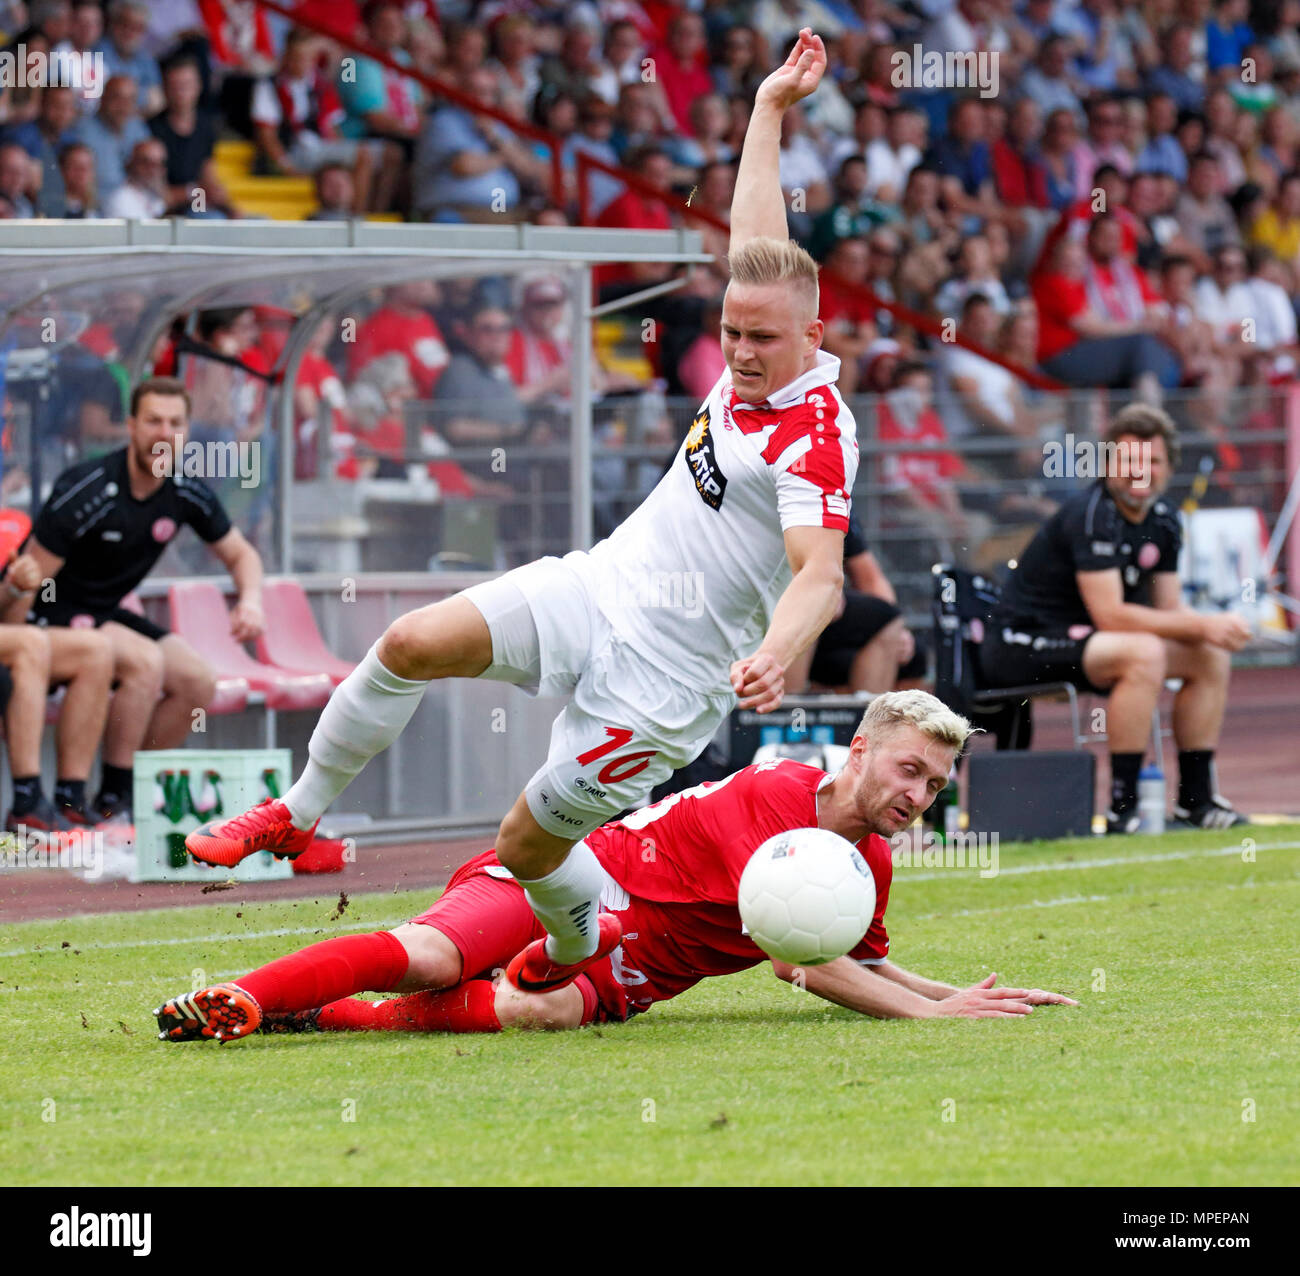 sports, football, Lower Rhine Cup, 2017/2018, final, Rot-Weiss Oberhausen vs Rot Weiss Essen 2:1, Stadium Niederrhein Oberhausen, scene of the match, Kai Proeger (RWE) left and Kai Nakowitsch (RWO) - Stock Image